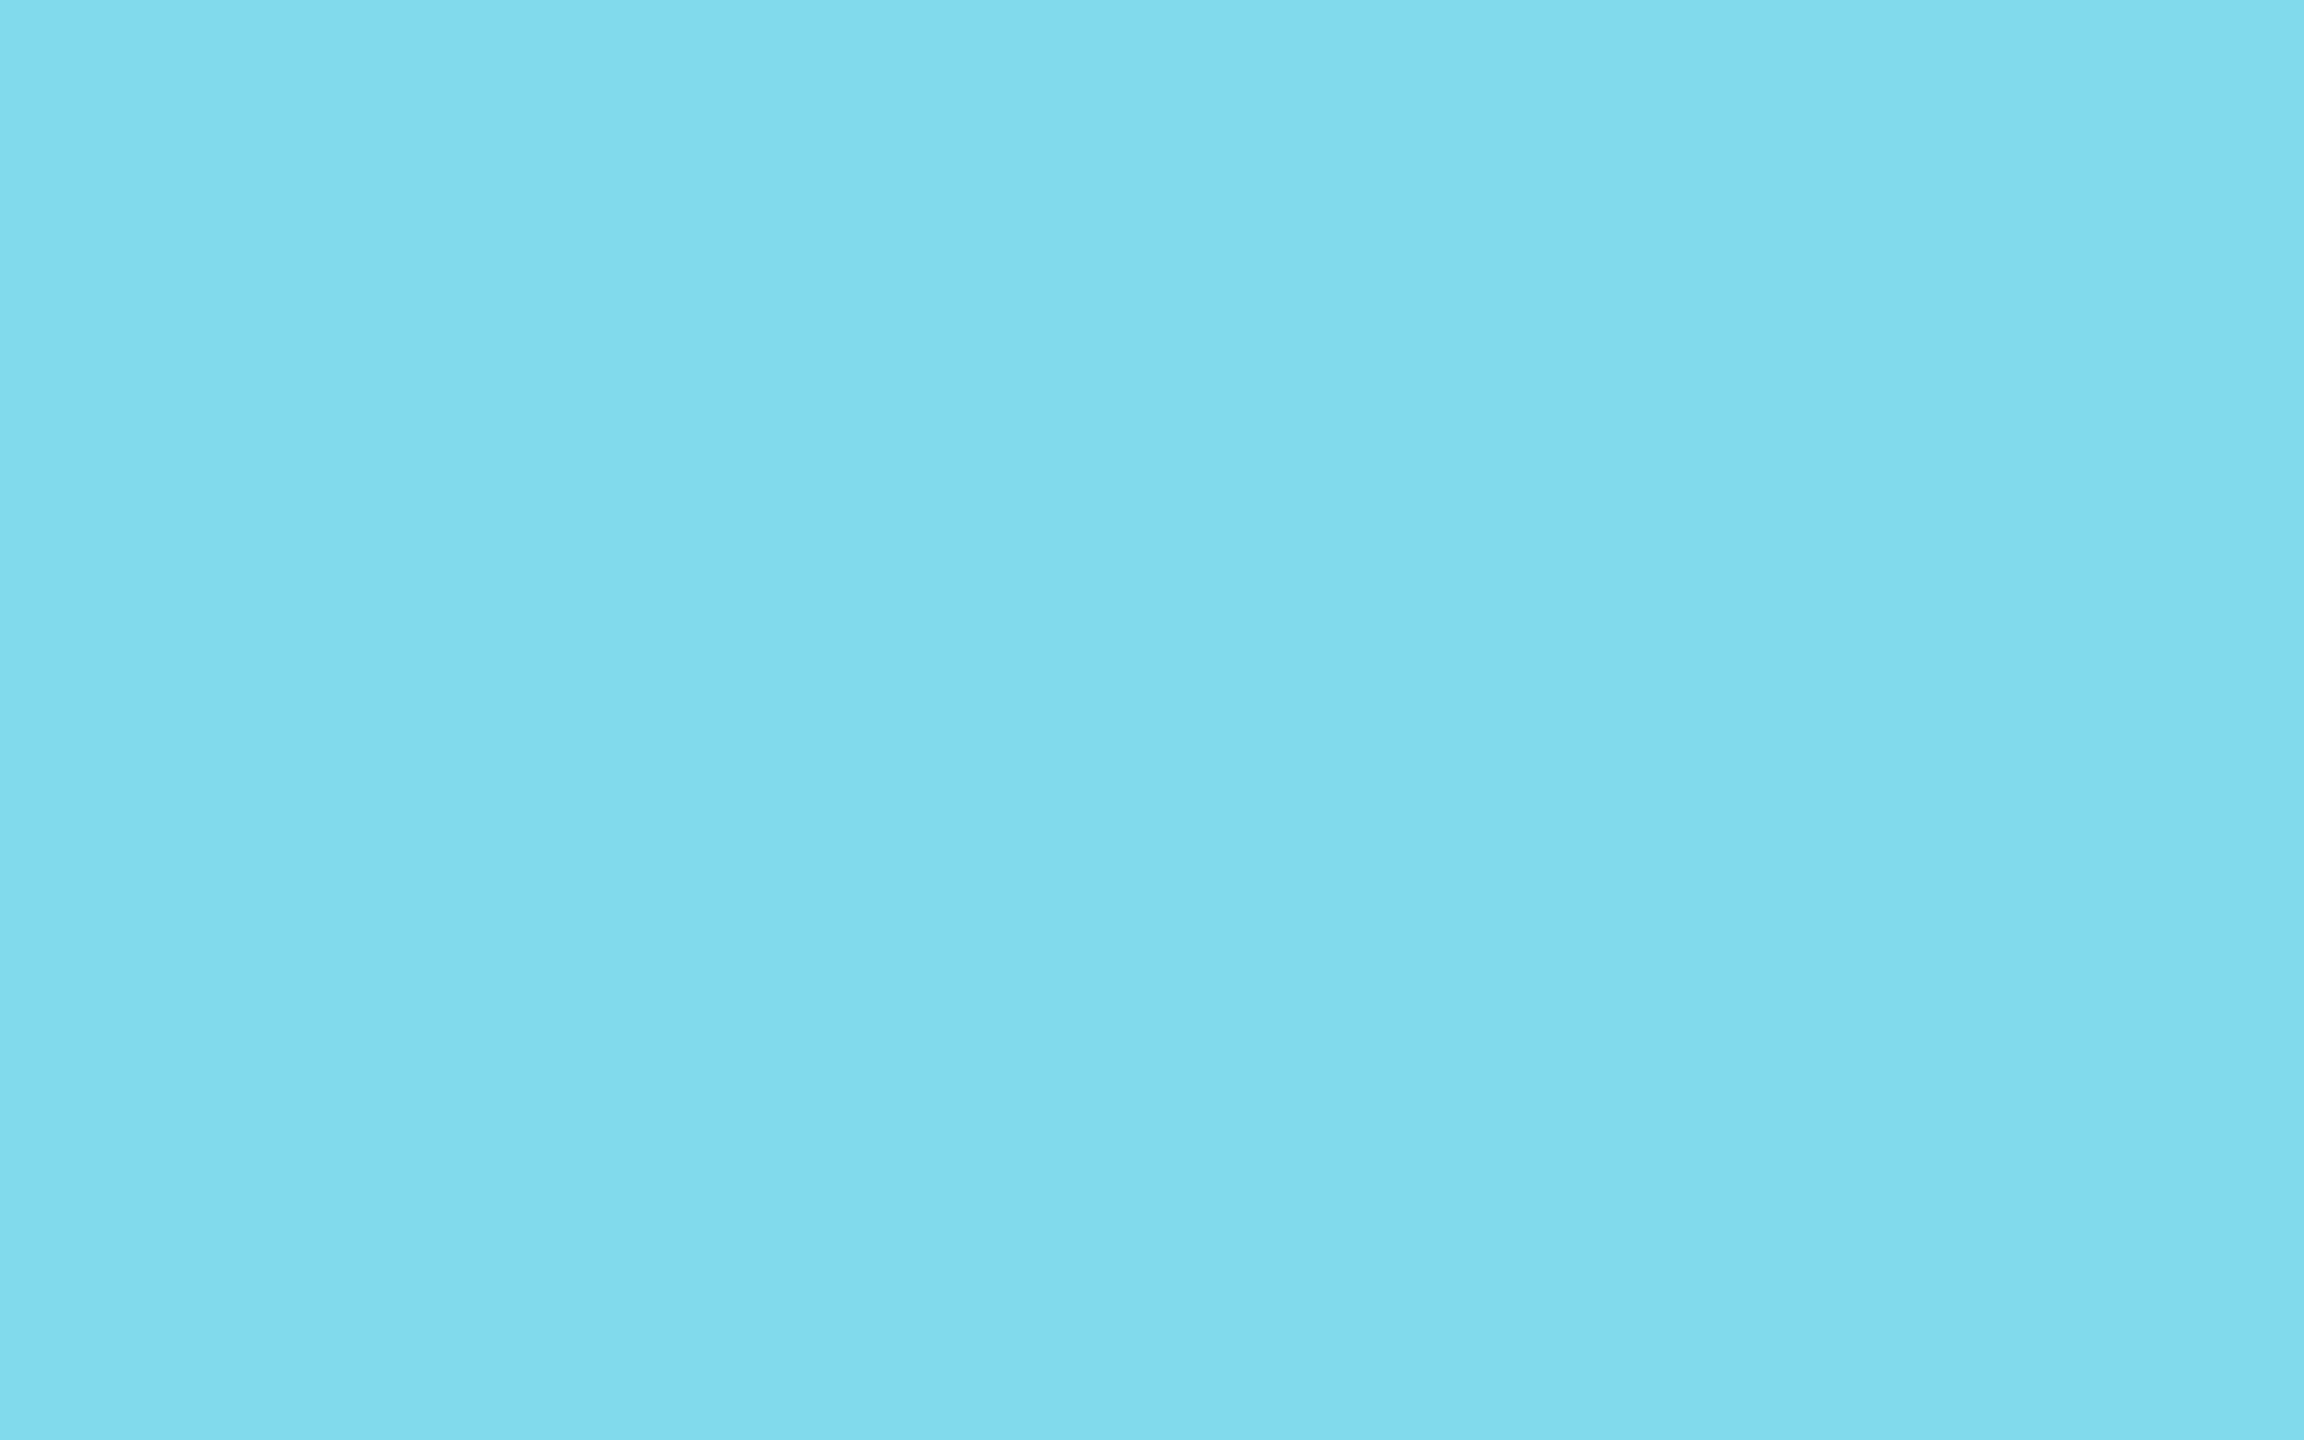 2304x1440 Medium Sky Blue Solid Color Background